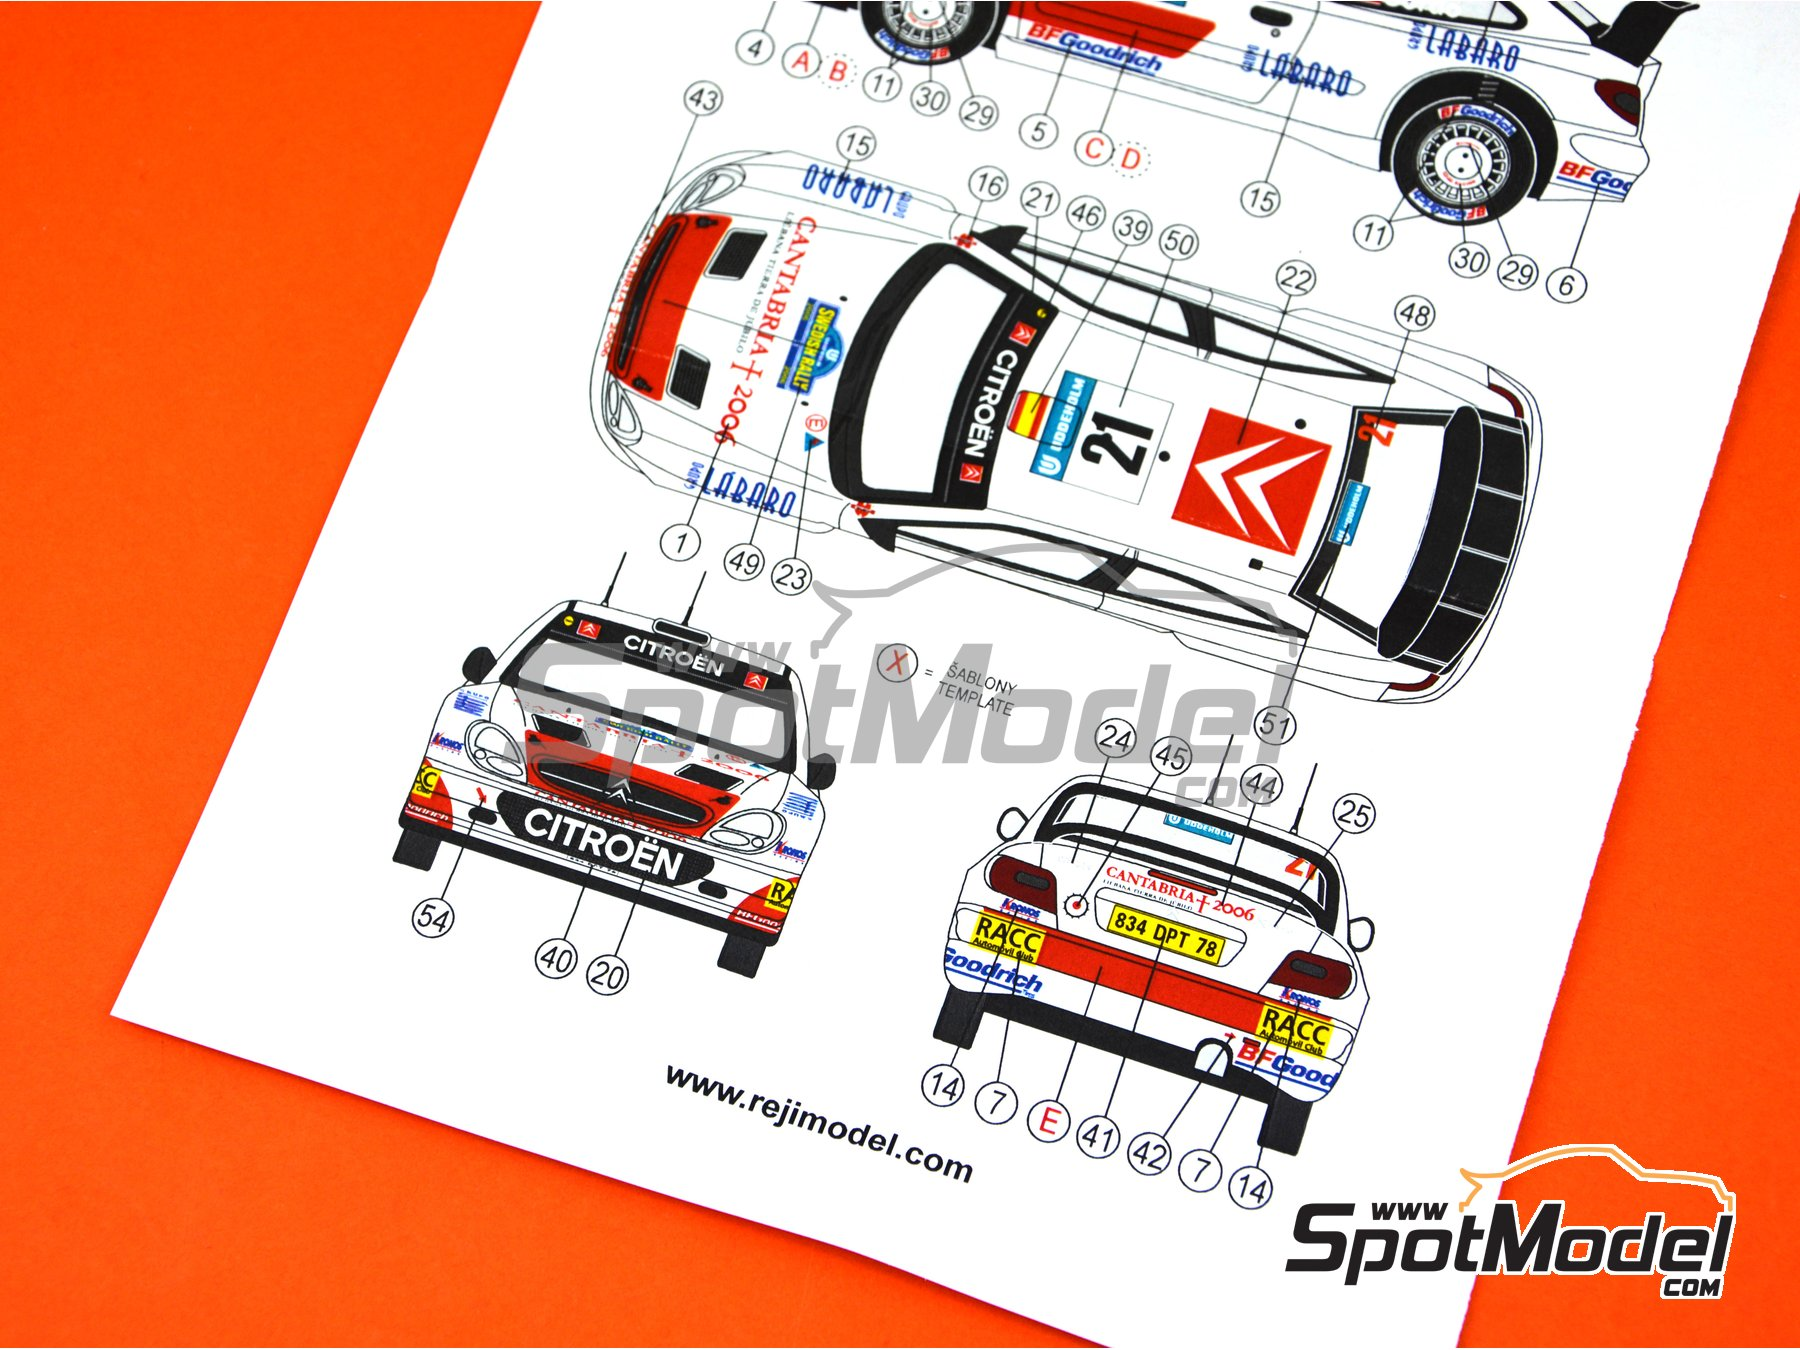 Image 6: Citroen Xsara WRC Kronos - Montecarlo Rally, Svezia Sweden Rally 2006 | Marking / livery in 1/24 scale manufactured by Reji Model (ref.REJI-102)